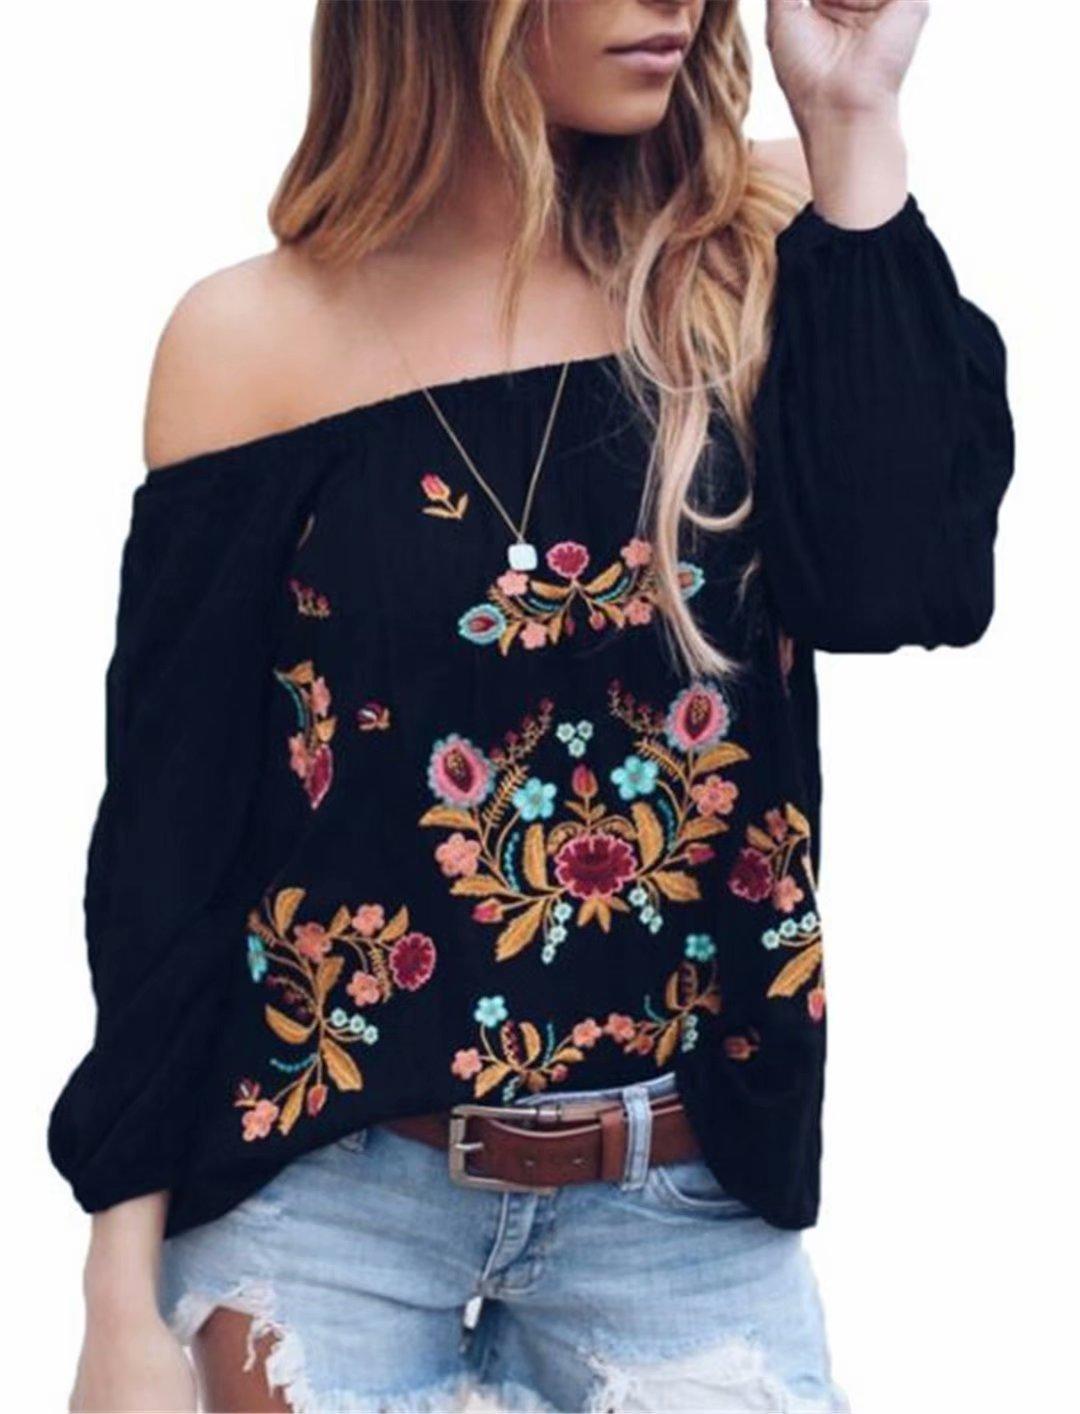 Women Vintage Off Shoulder Chiffon Top Summer Floral Printed Half Sleeve Blouse T-Shirt Size M (Black)